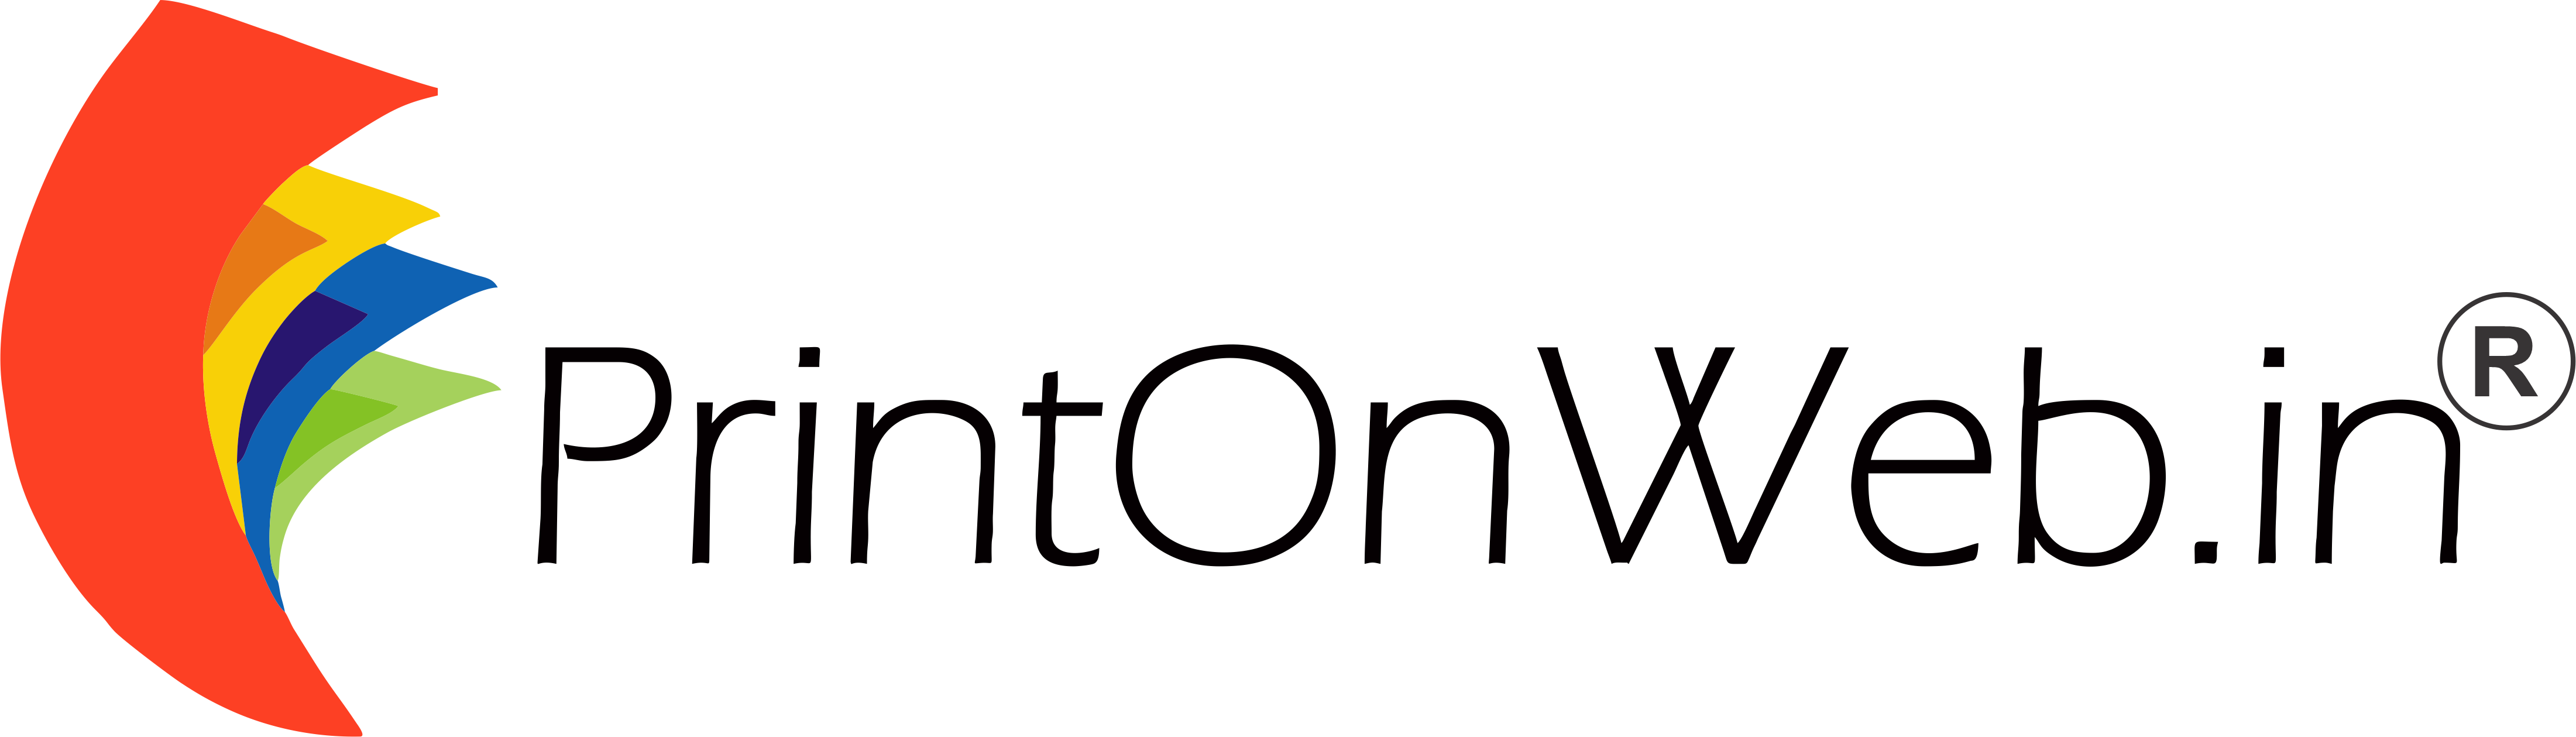 PrintOnWeb.in